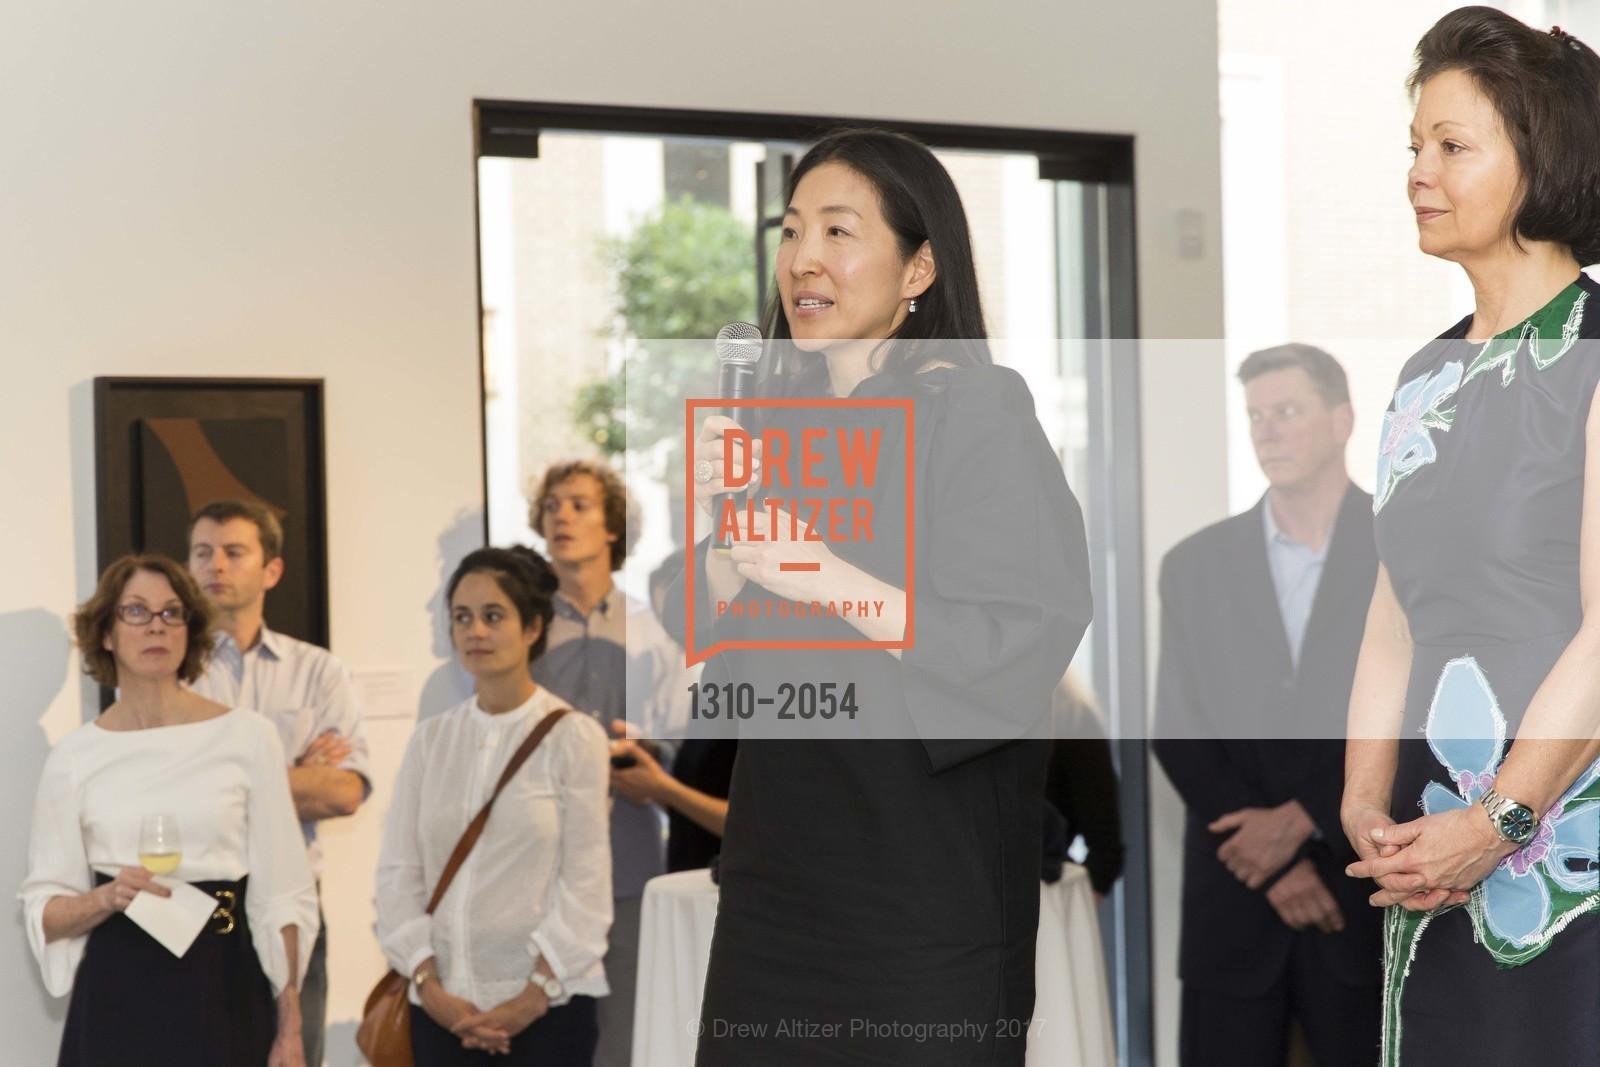 Sharon Kim, Christie's Spring Tour 2017, Wendi Norris Gallery. Van 161 Jesse Street, April 20th, 2017